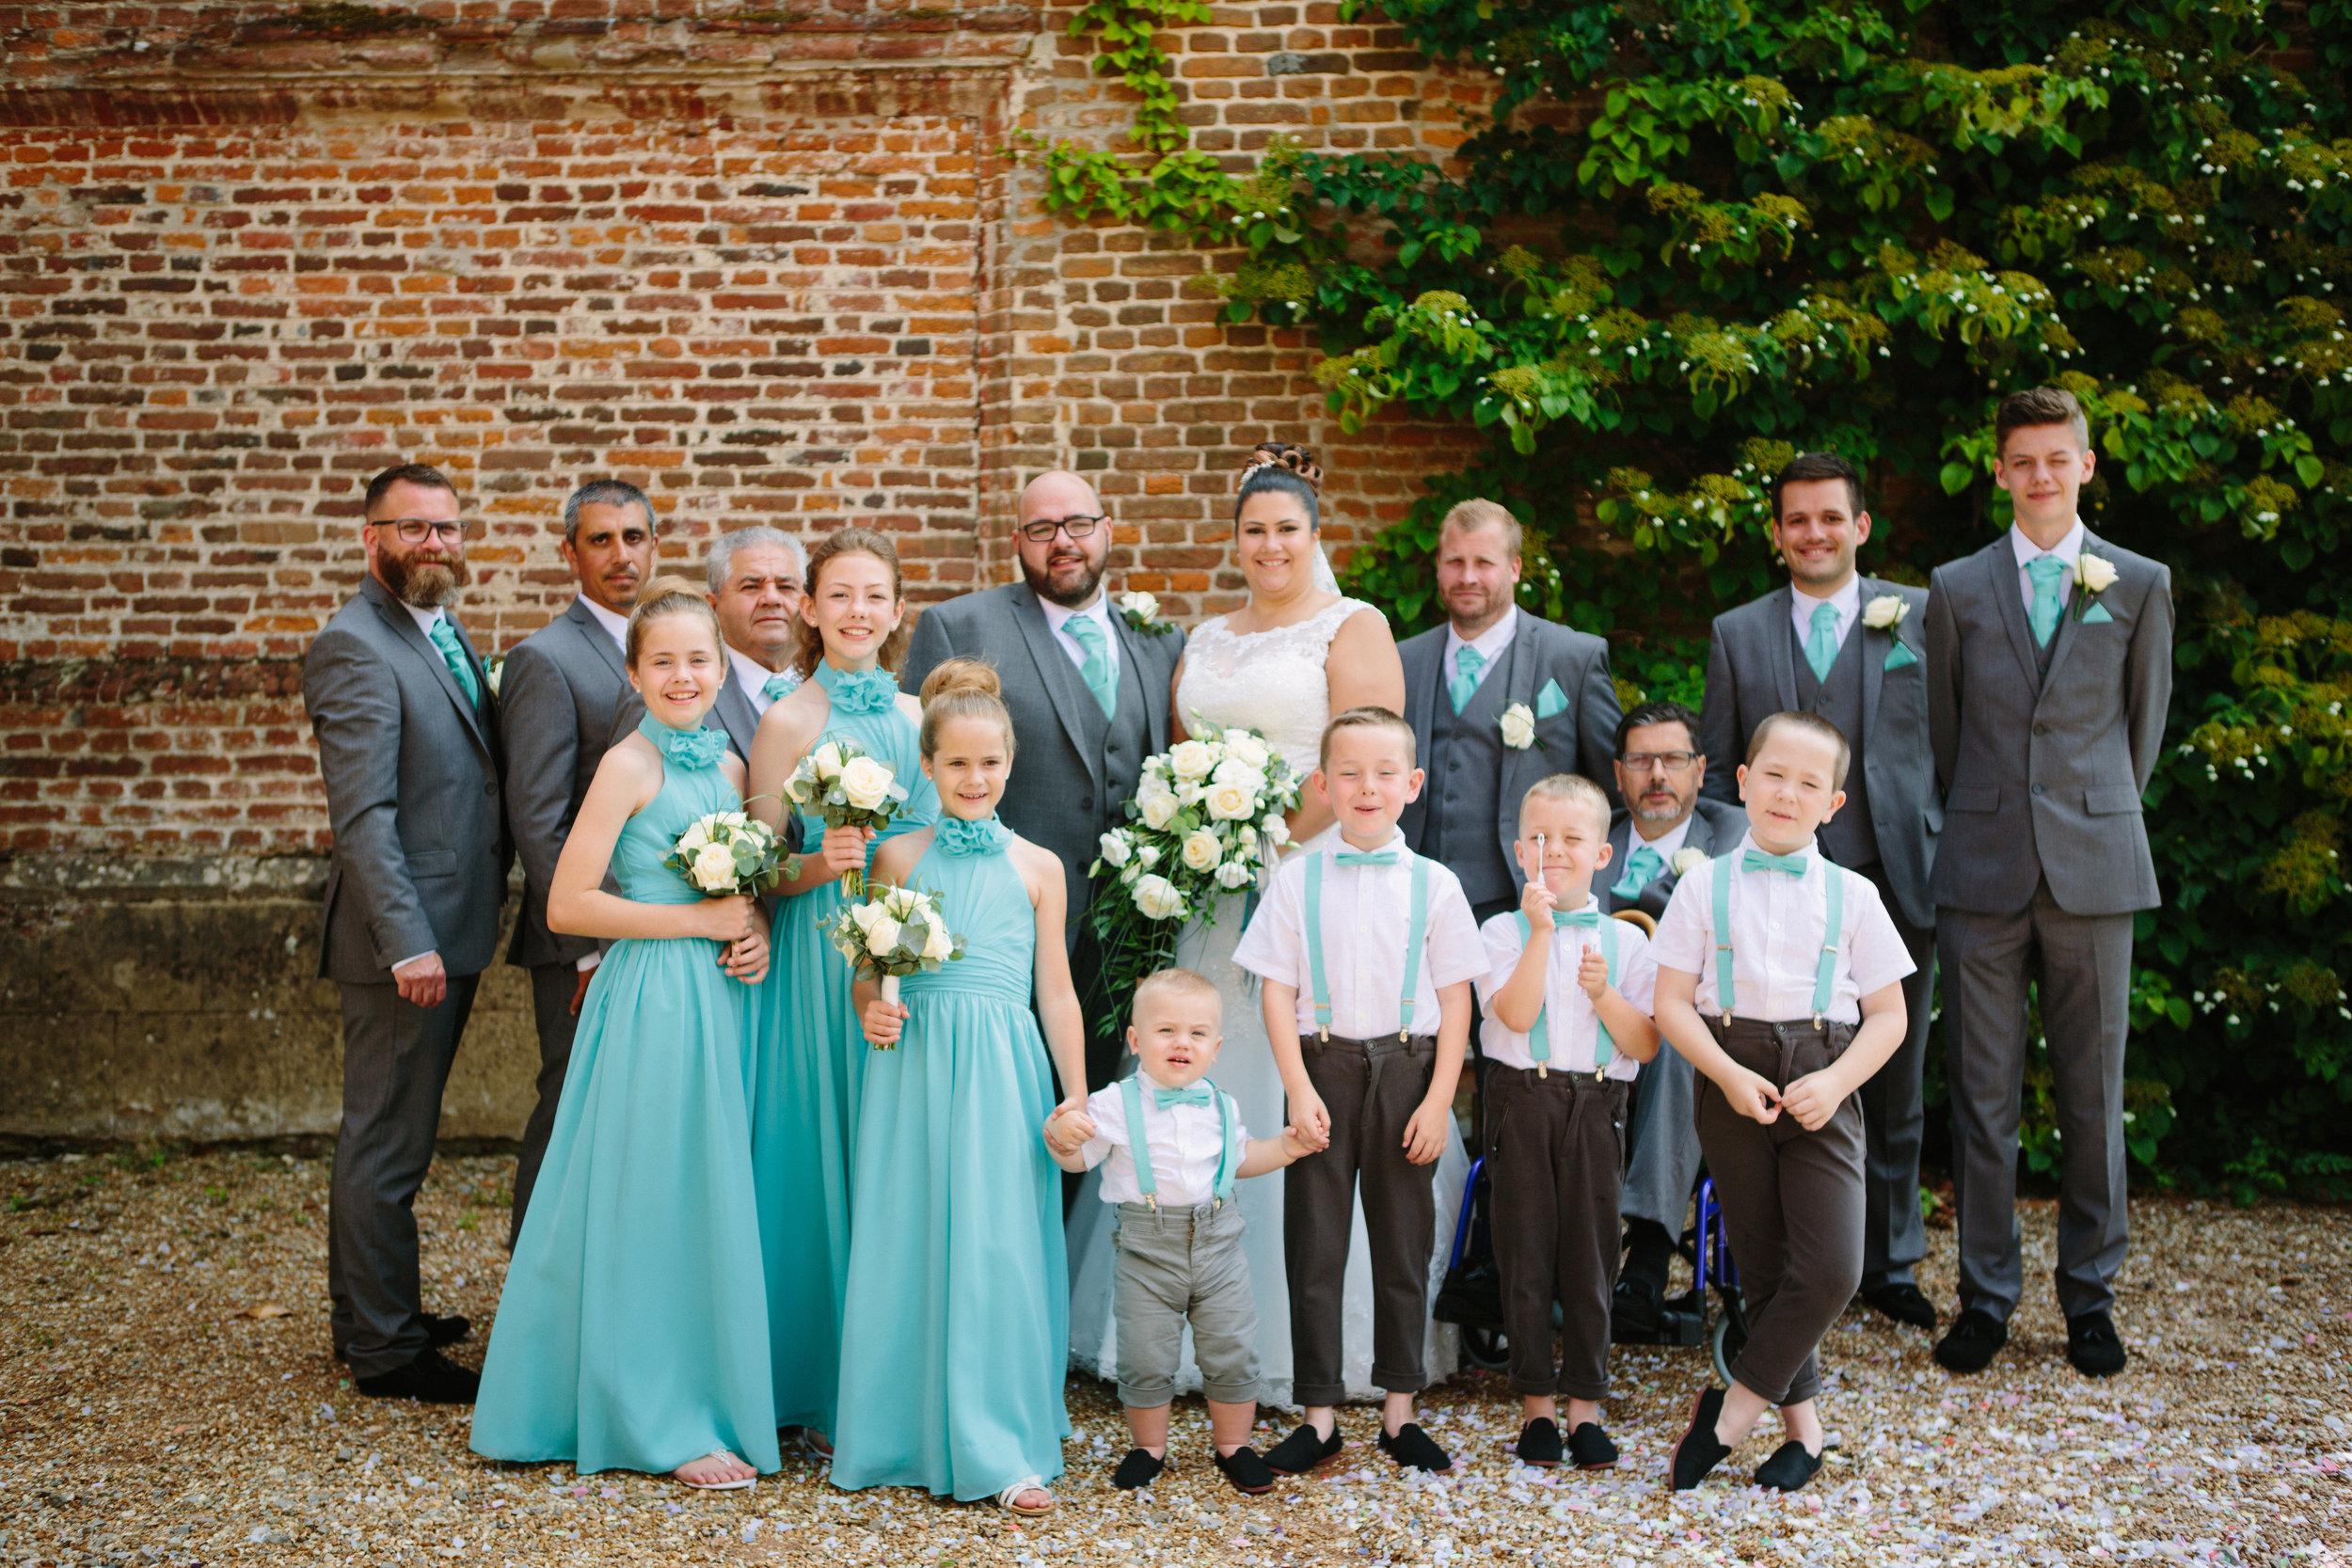 westenhangar-castle-kent-london-wedding-photography-formal-portrait-group-45